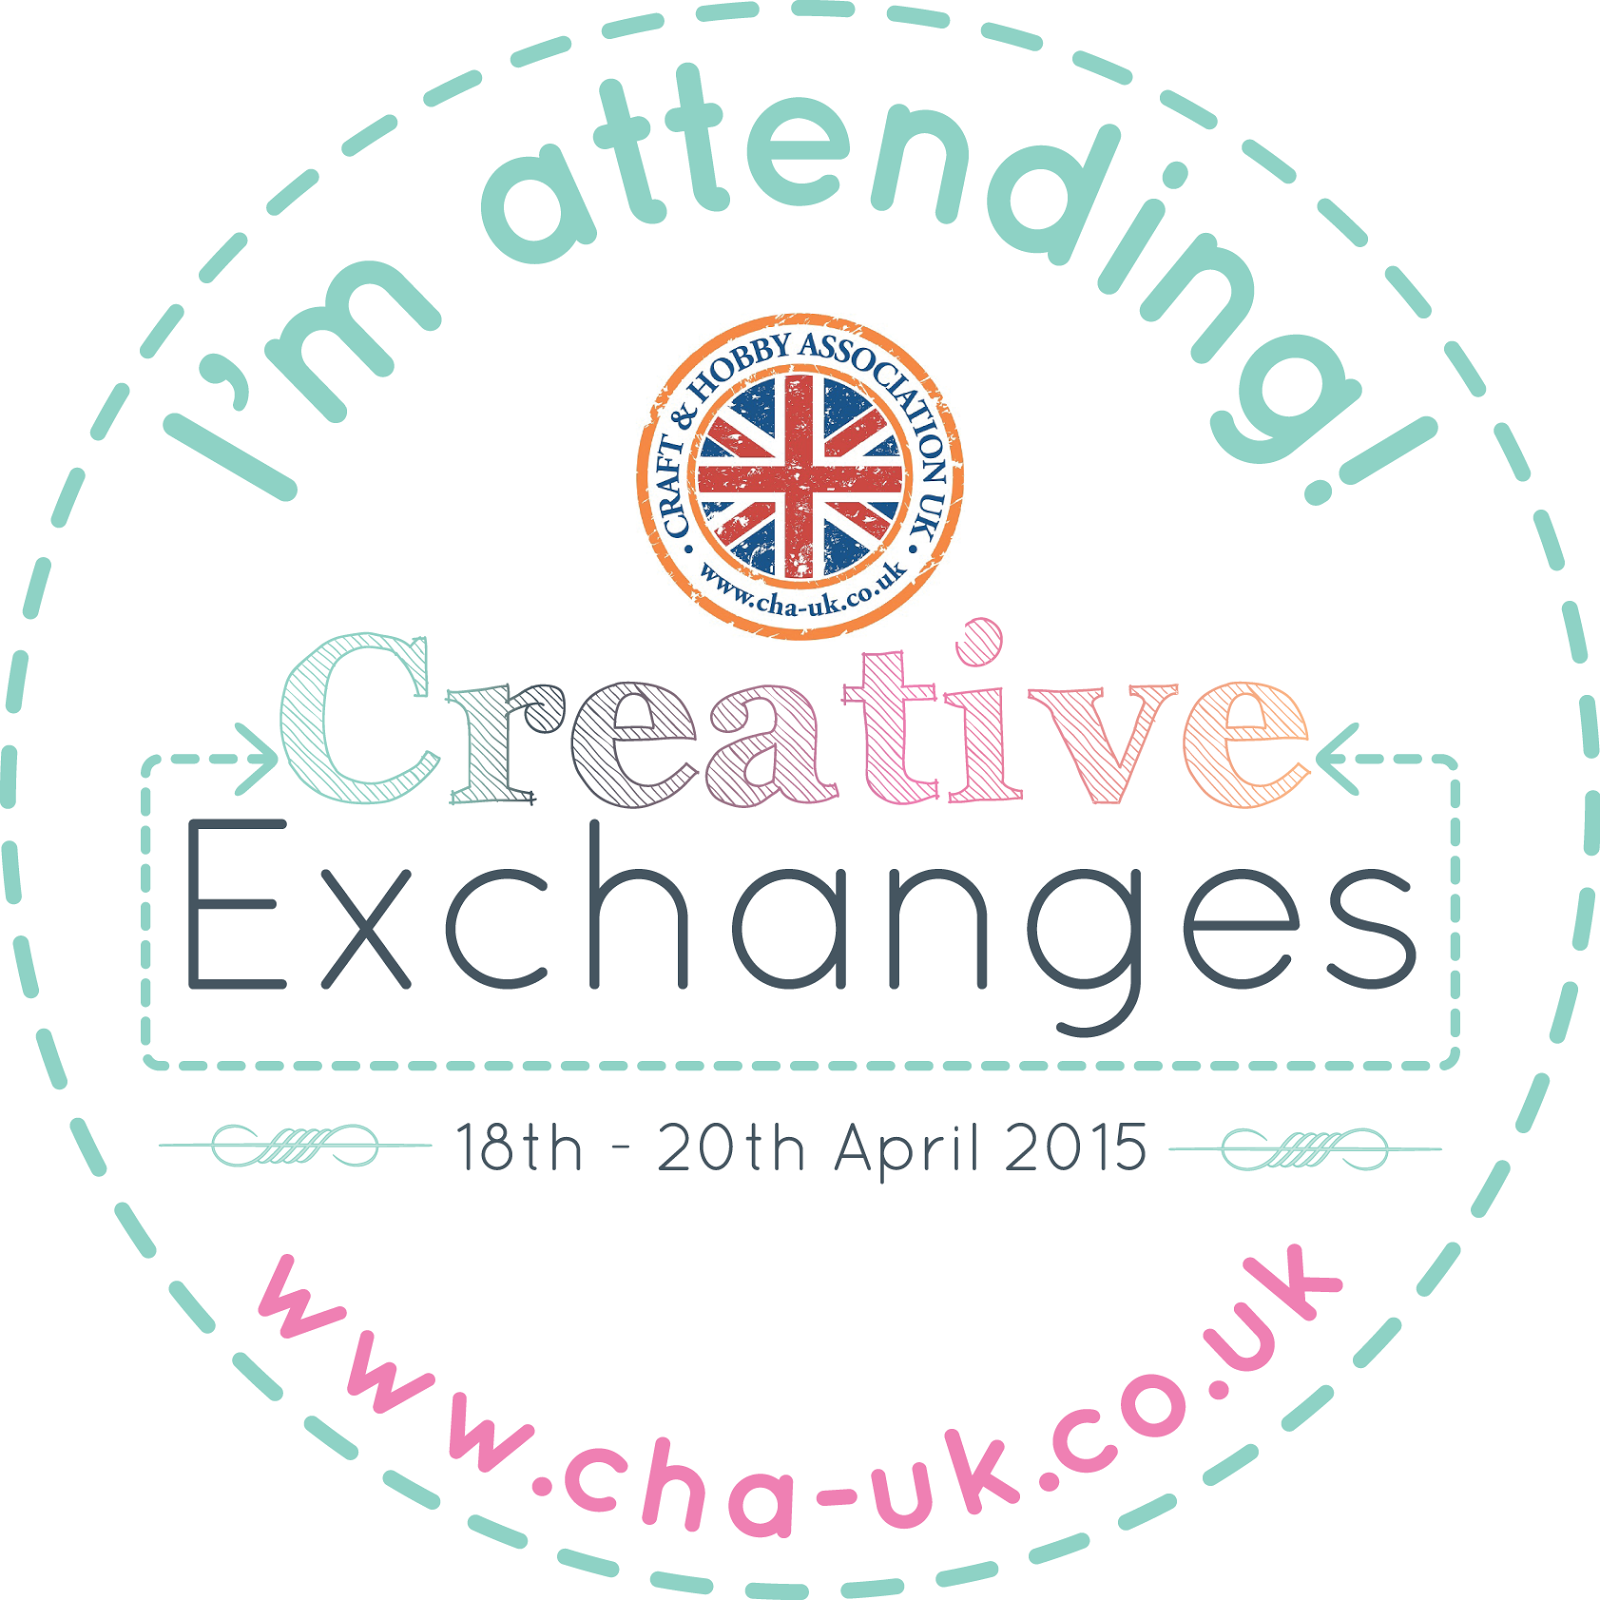 http://1.bp.blogspot.com/-1_zBmE8Wdvw/VQn4DgQK_xI/AAAAAAAAIIc/SiifV1aWw-c/s1600/attending-creative-exchanges-circle.png